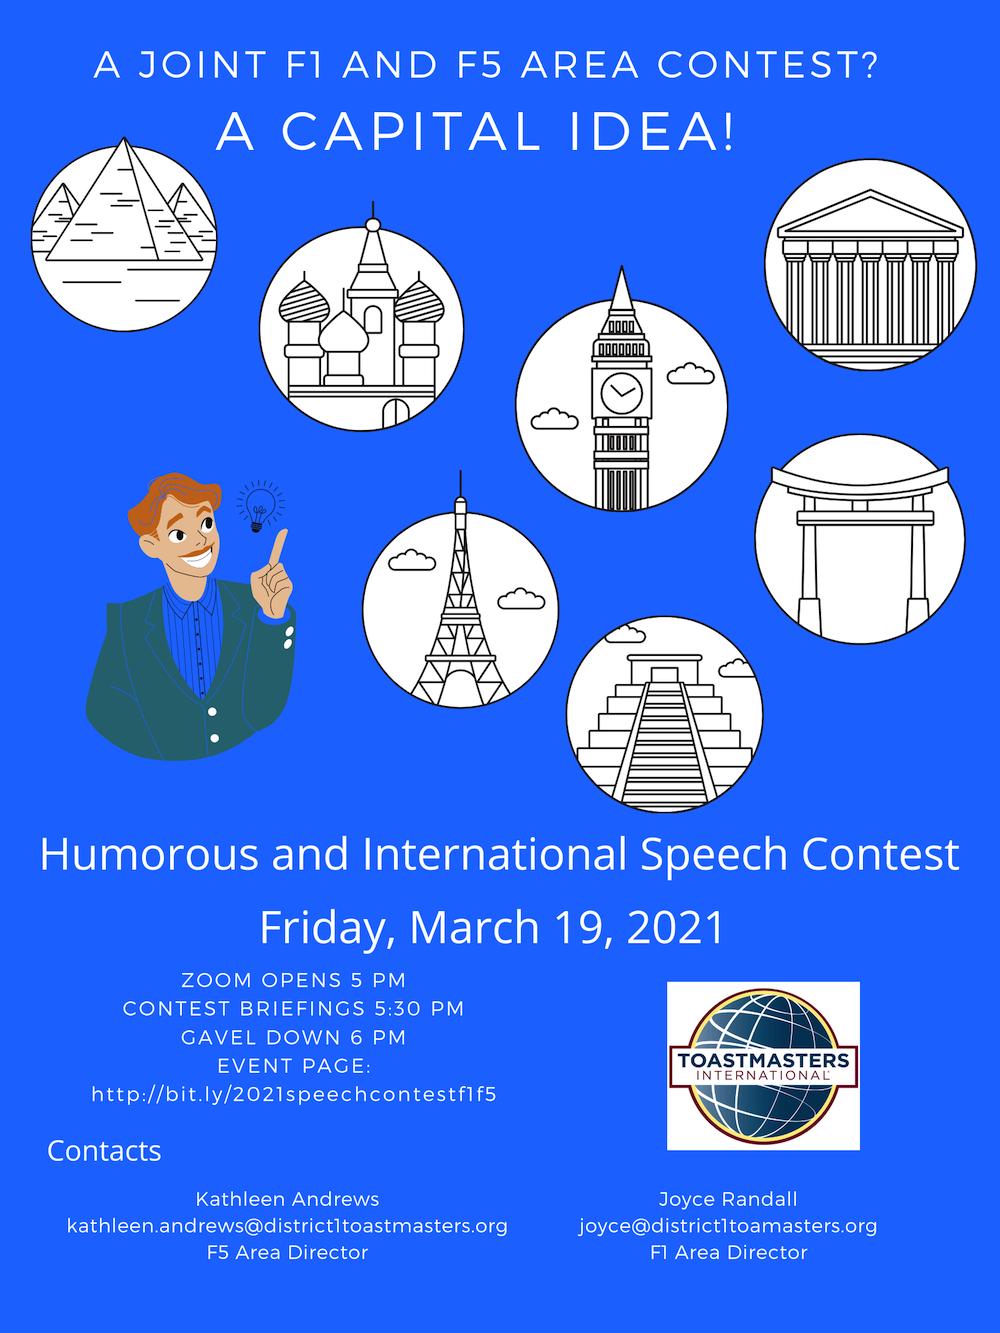 Area F1/F5 International Speech Contest